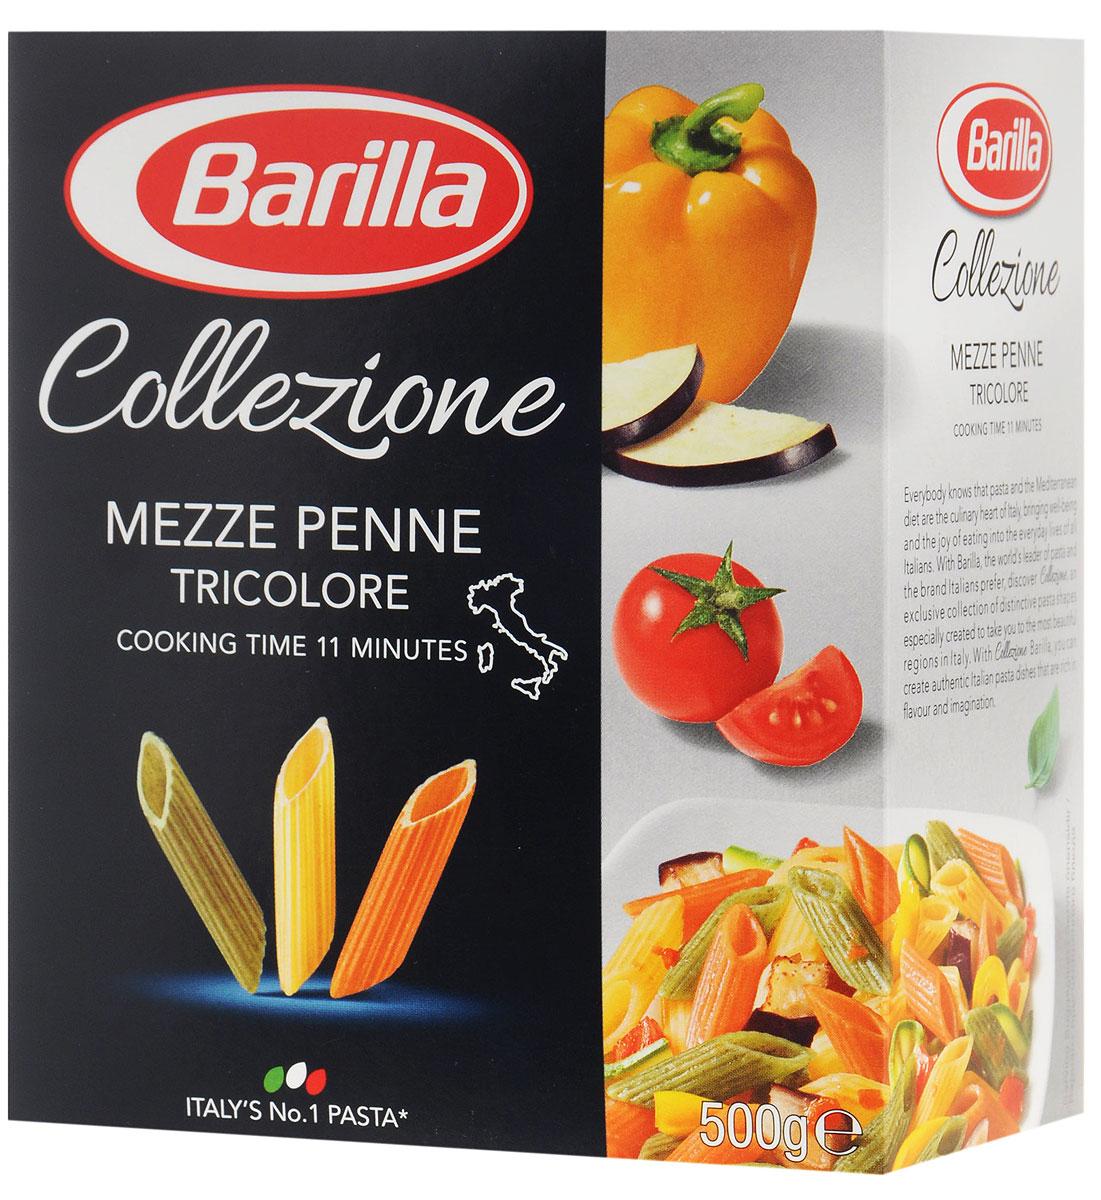 Barilla Mezze Penne Tricolore паста мецце пенне трехцветные, 500 г